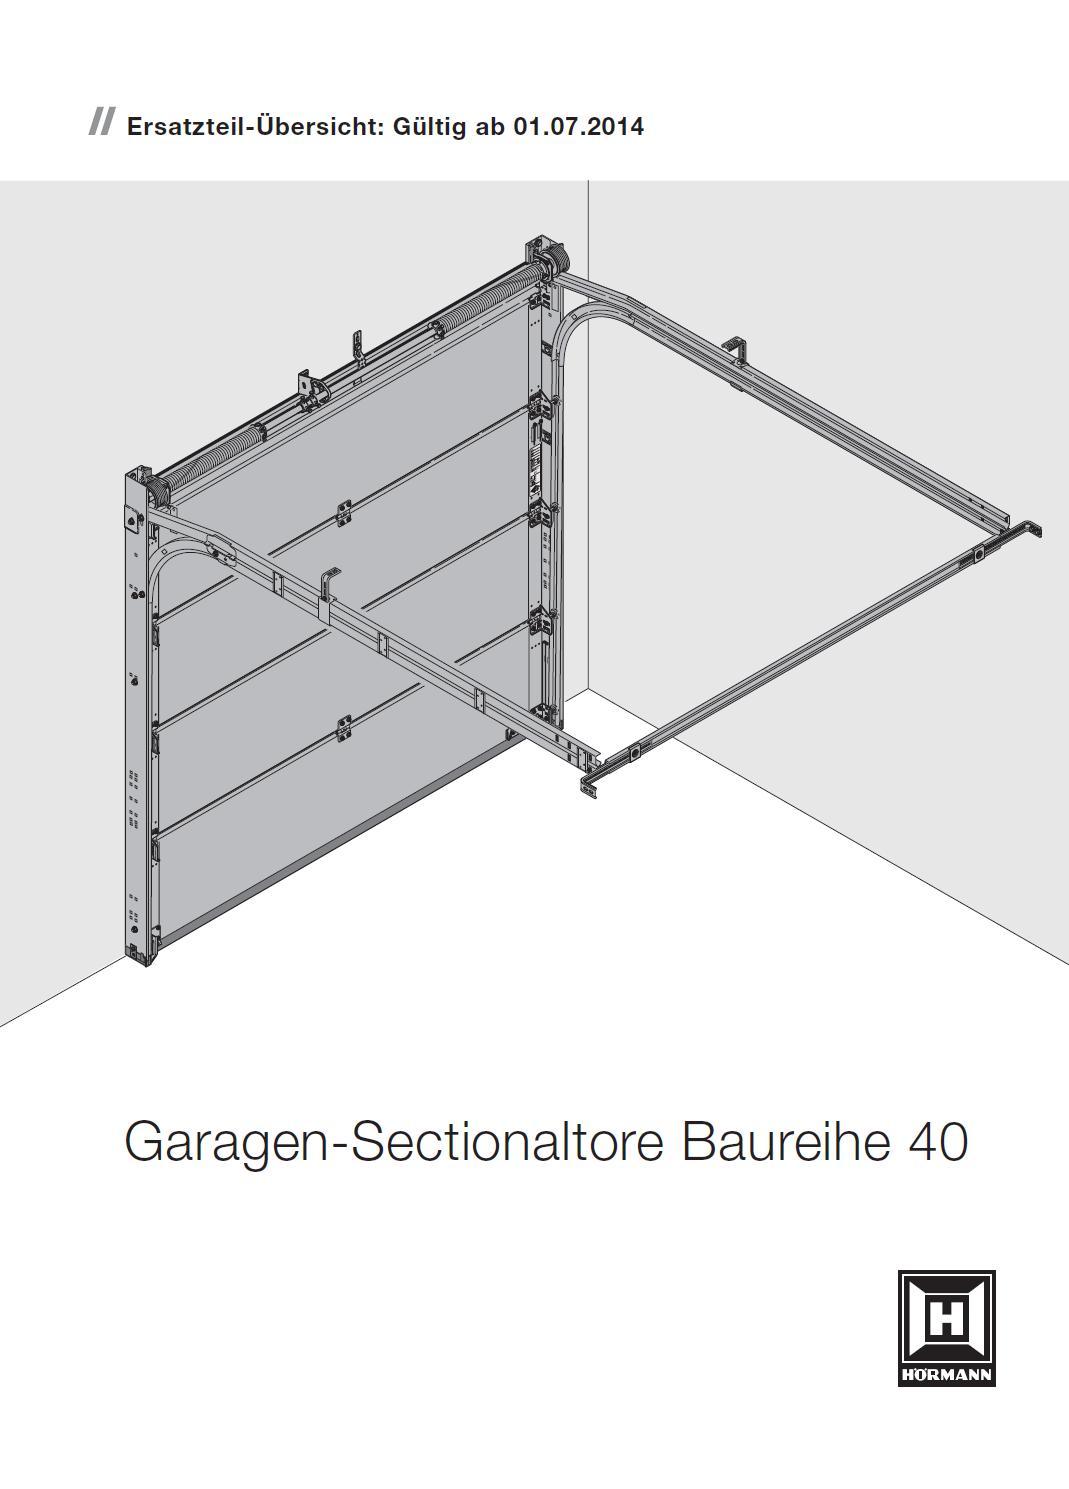 ersatzteile h rmann garagen sectionaltor lte 30 epu 40 lpu 30 ltf 40 bei tarotore. Black Bedroom Furniture Sets. Home Design Ideas